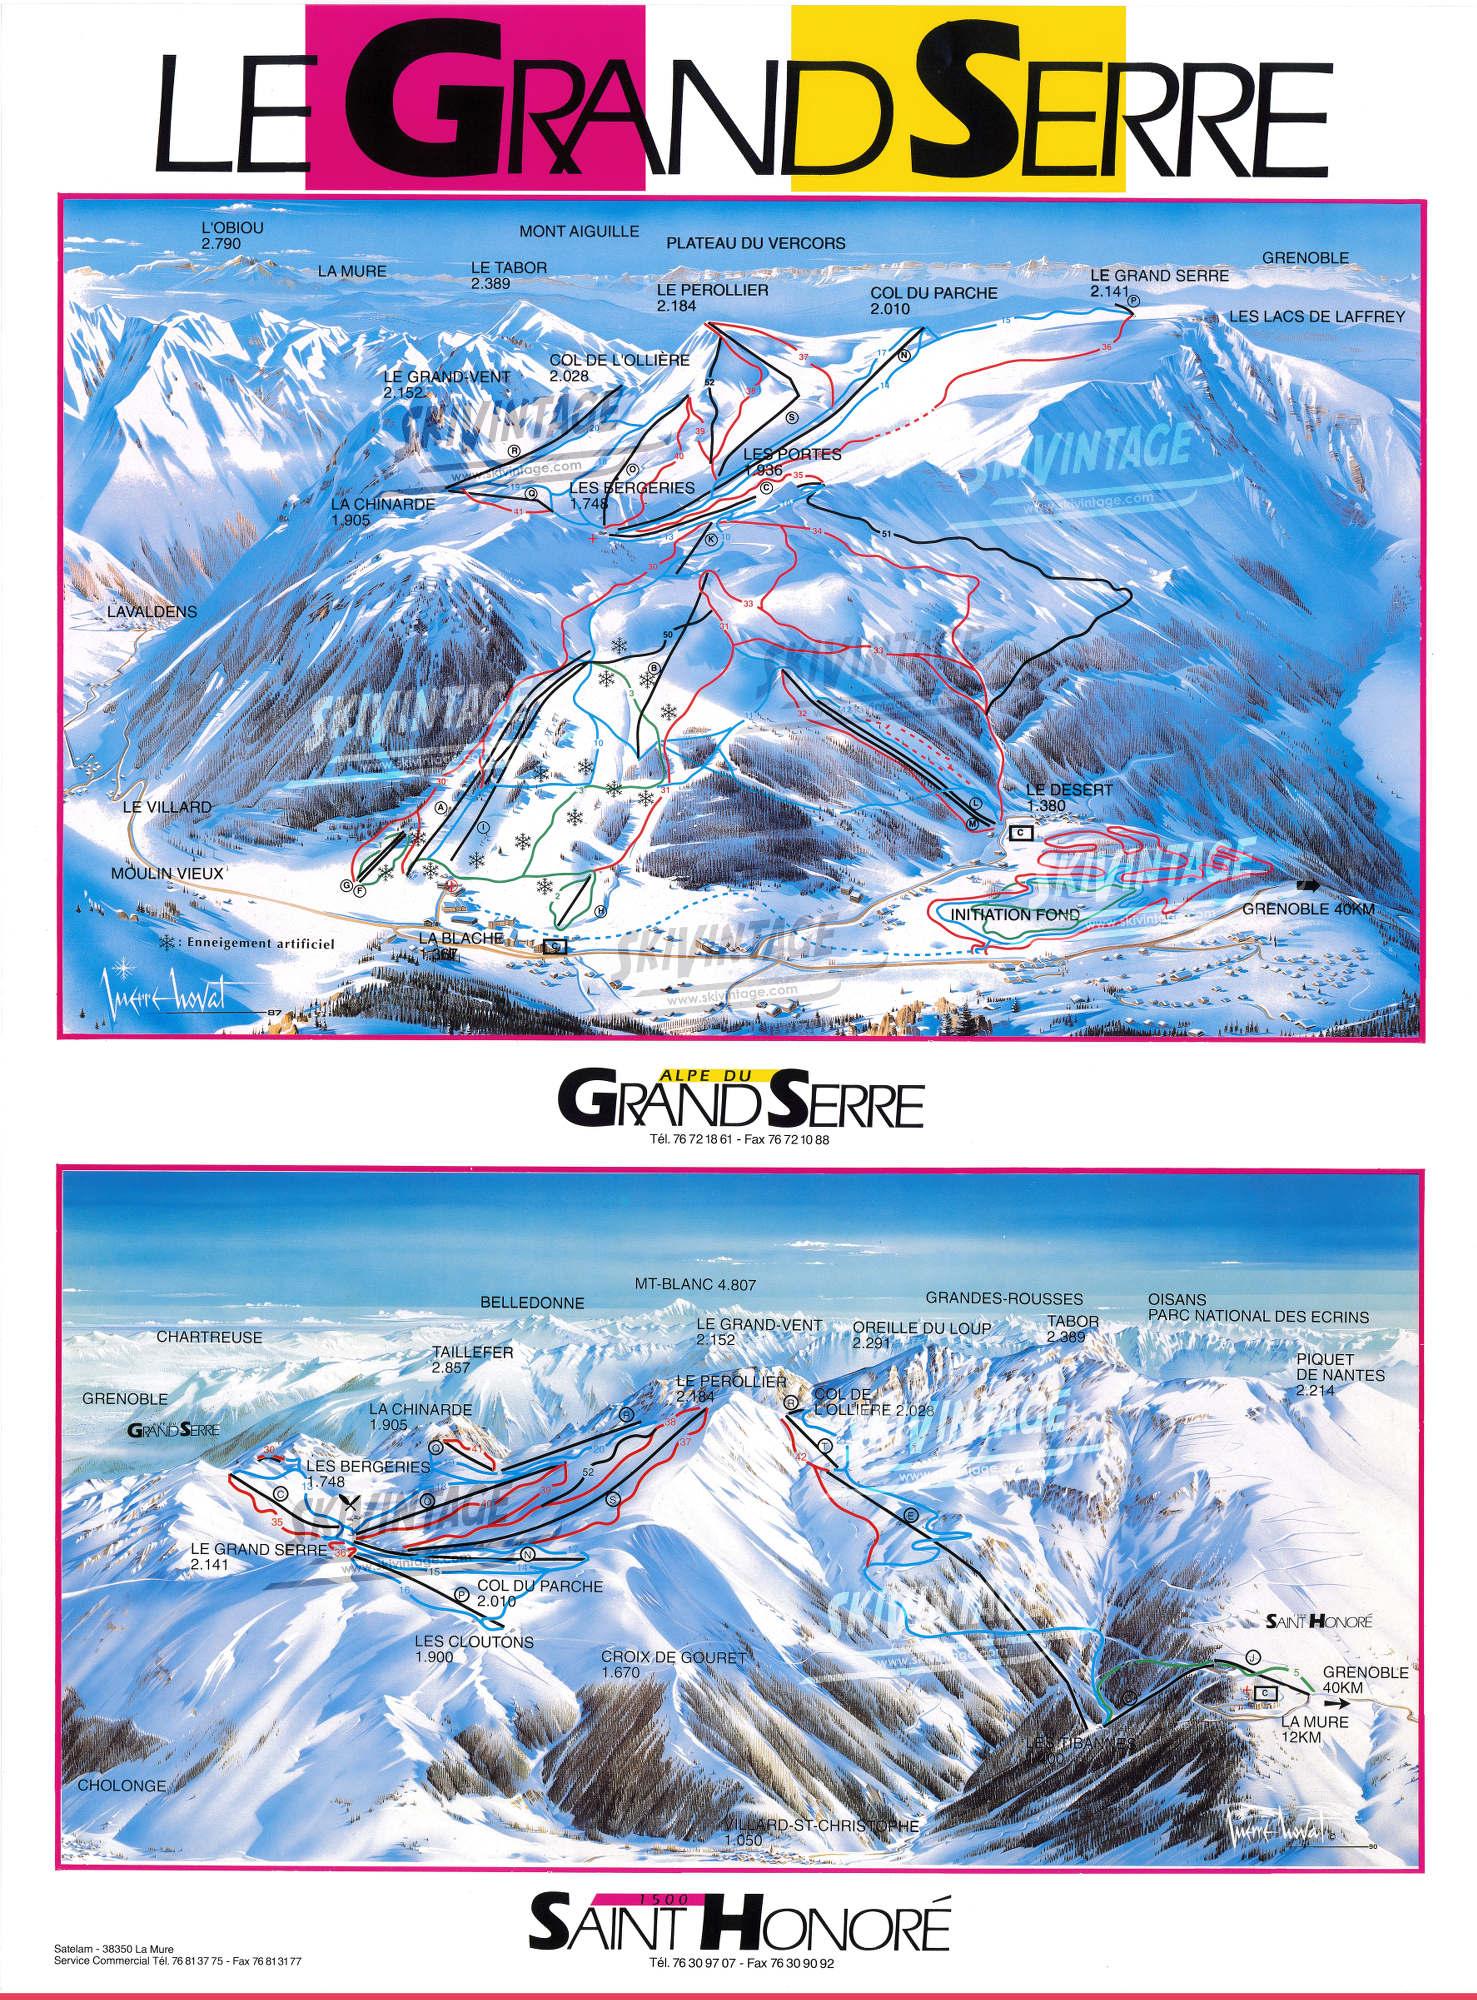 Le grand serre alpe du grand serre saint honor 1500 - Office du tourisme alpes du grand serre ...